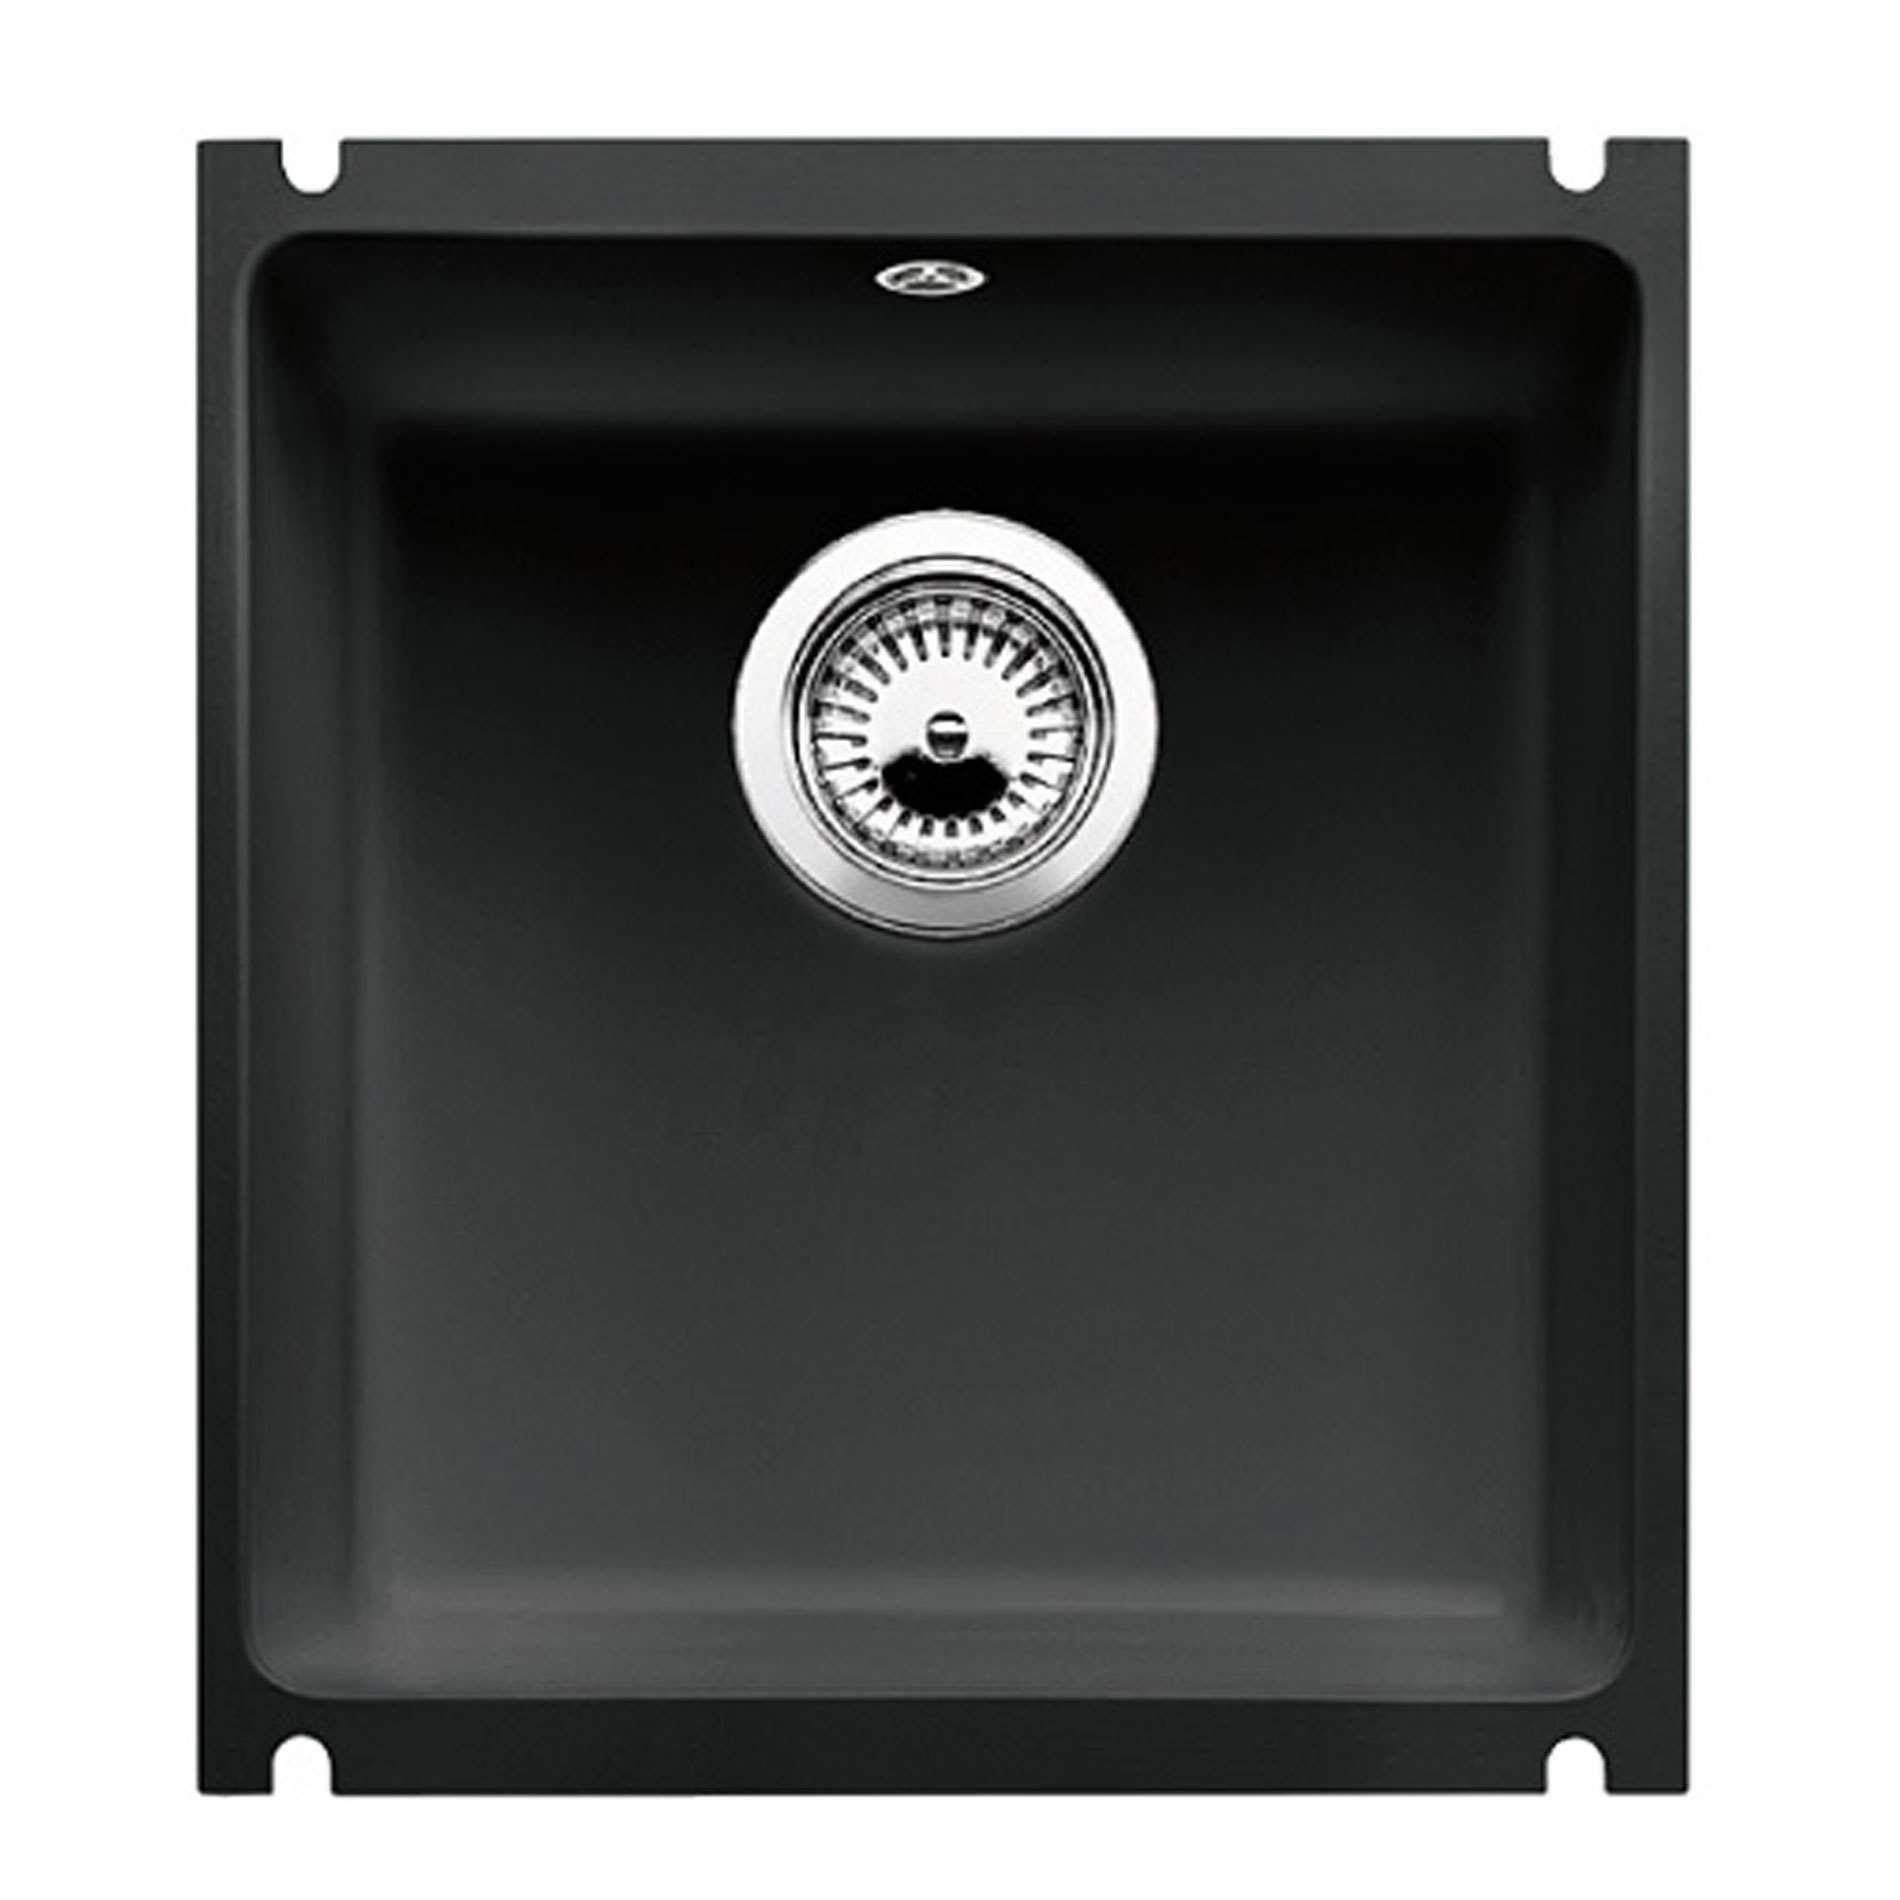 Blanco subline 375 u black ceramic sink kitchen sinks taps picture of subline 375 u black ceramic sink workwithnaturefo